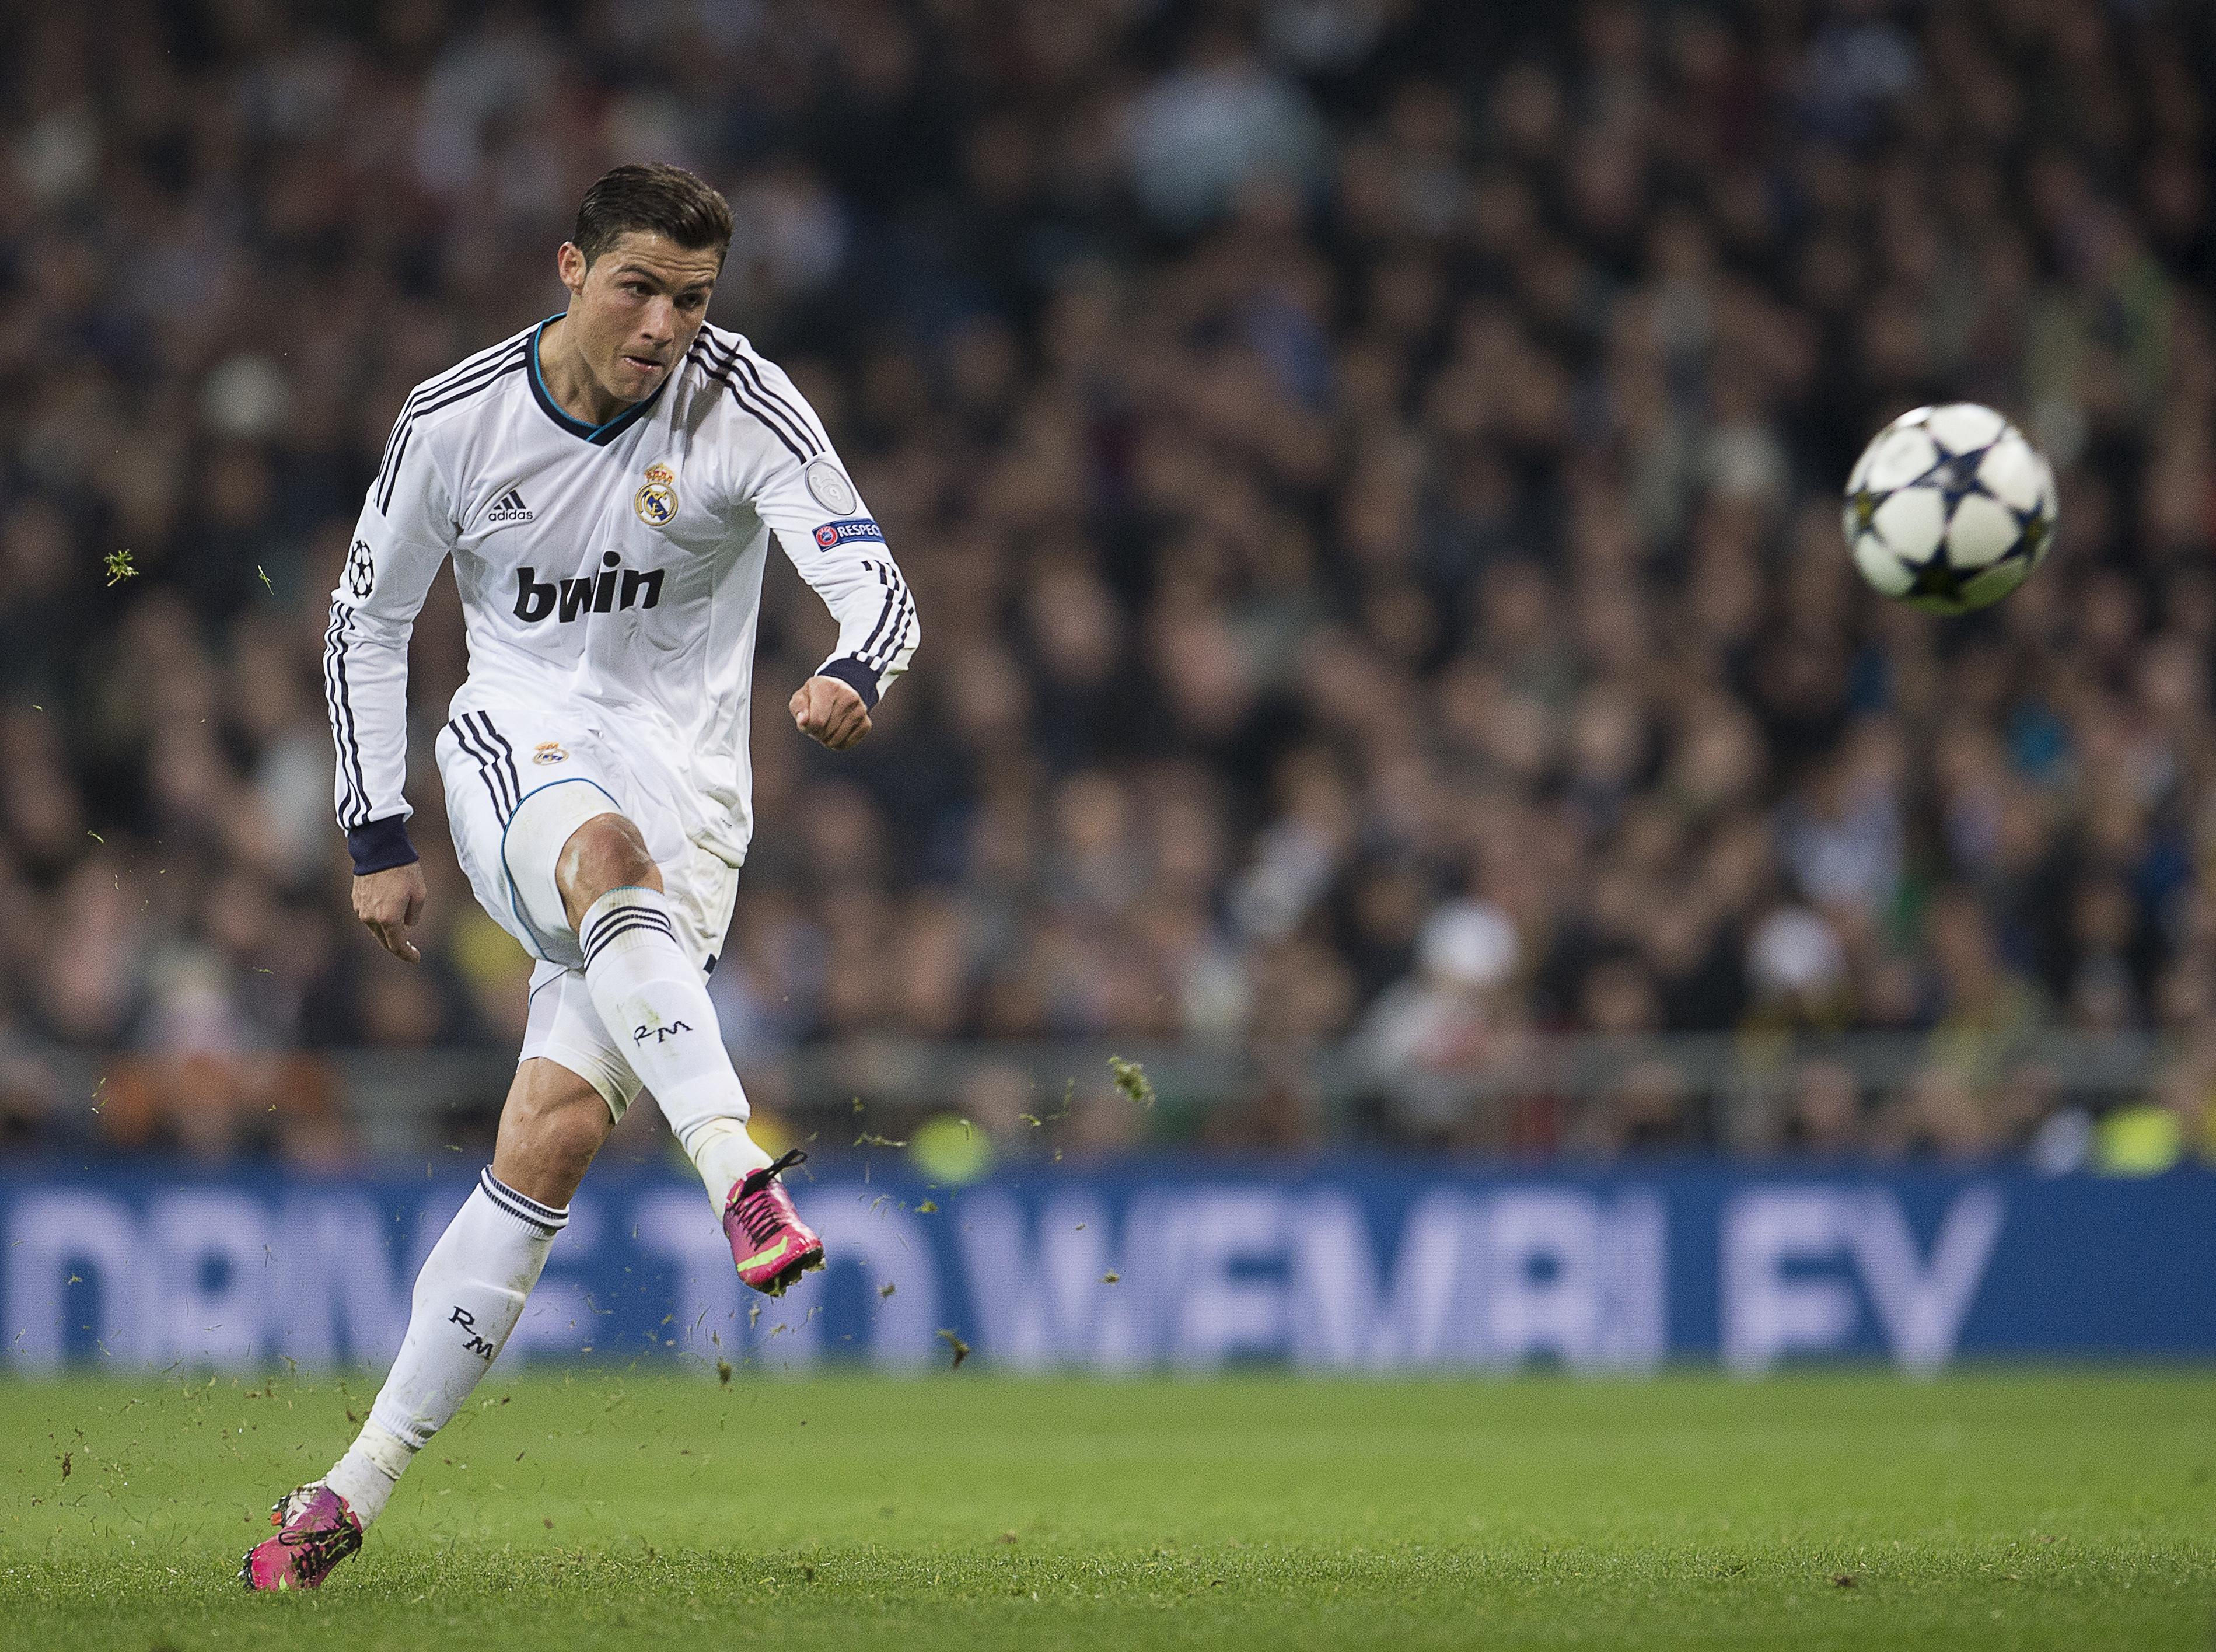 Cristiano Ronaldo Free Kick Wallpaper 6